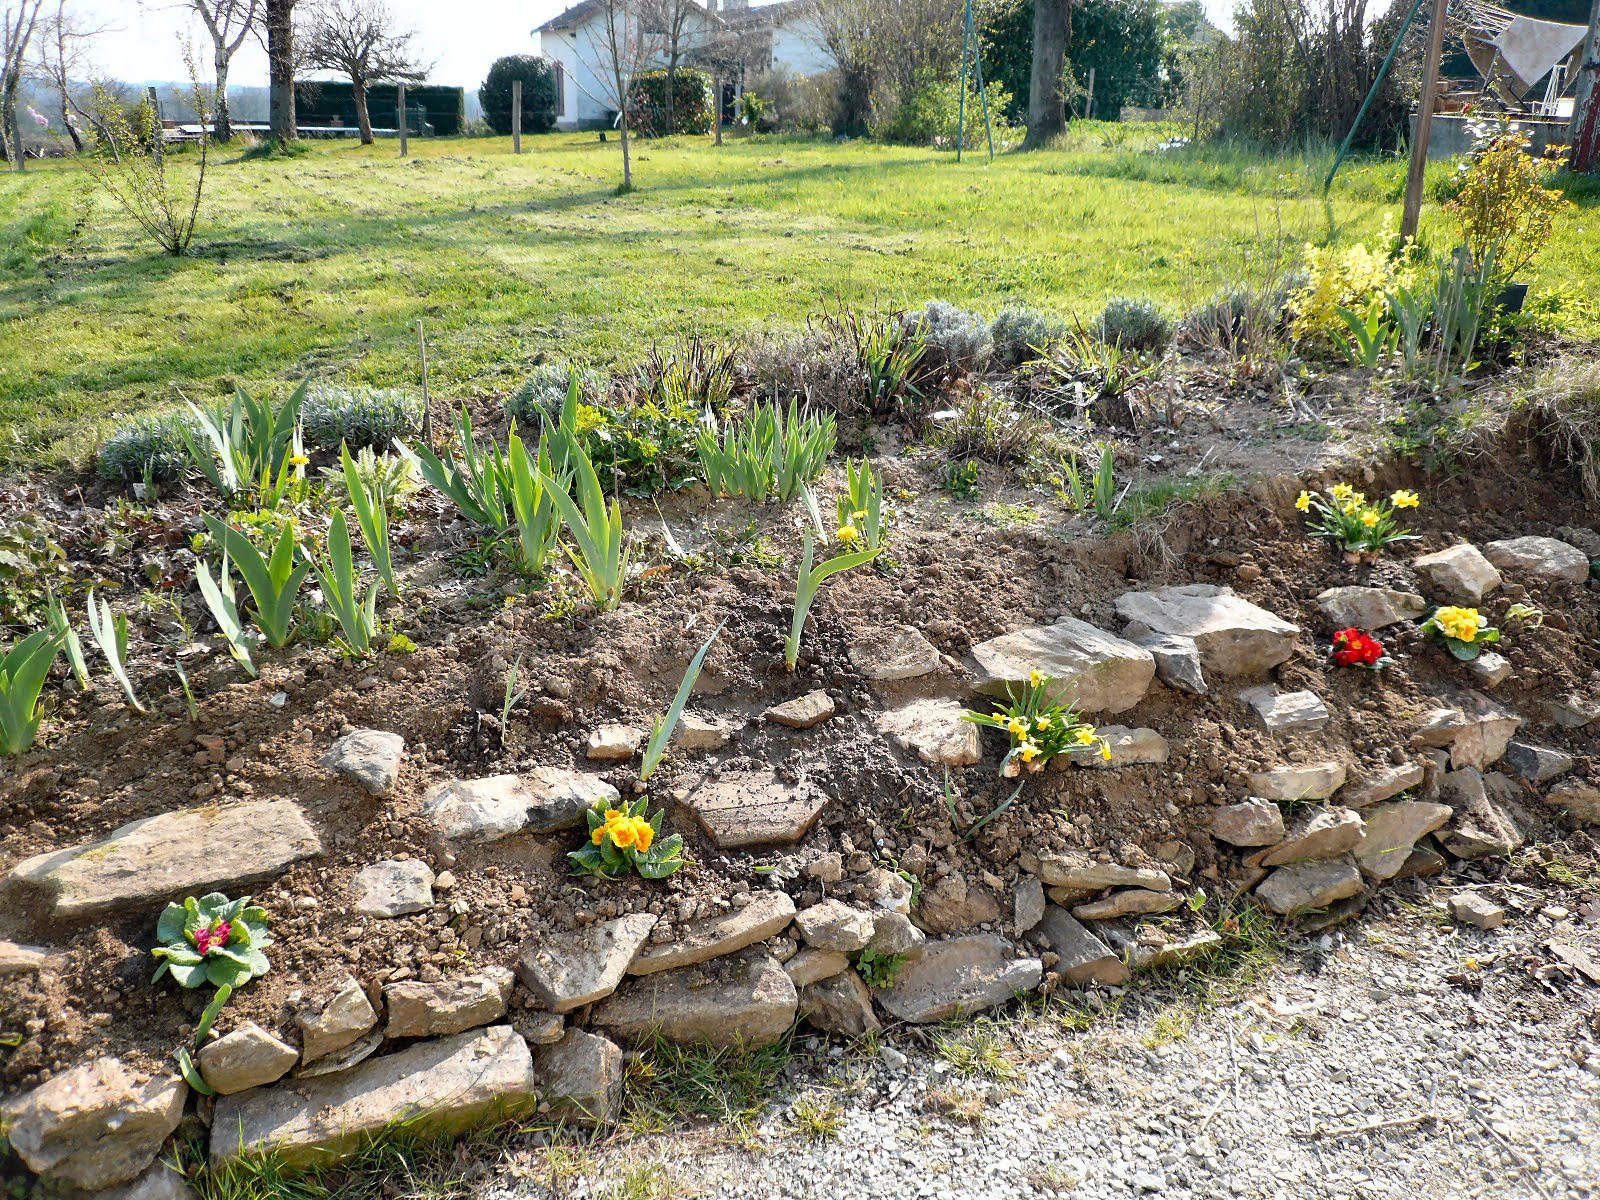 1000 images about rockery gardens on pinterest rockery for Garden rockery designs